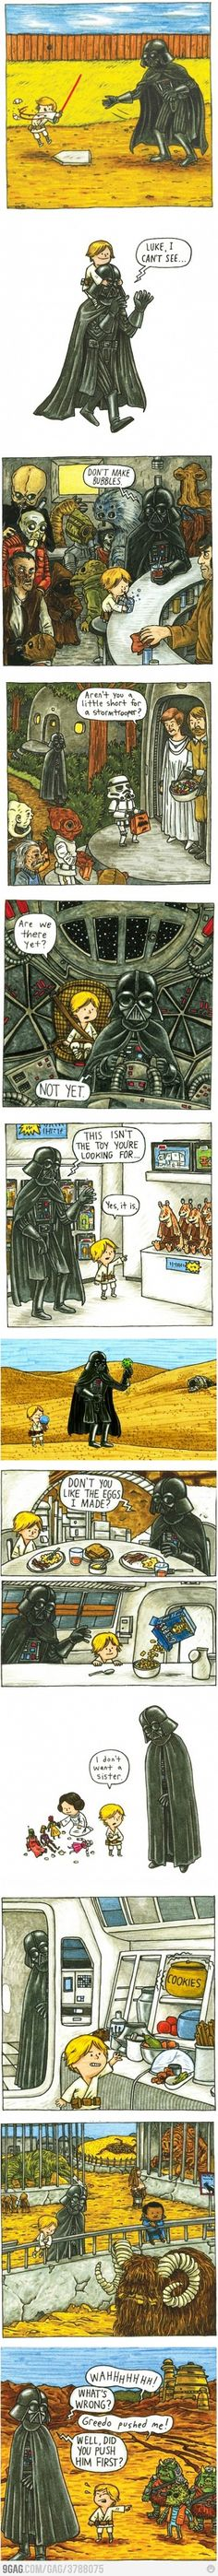 Darth Vader and Luke